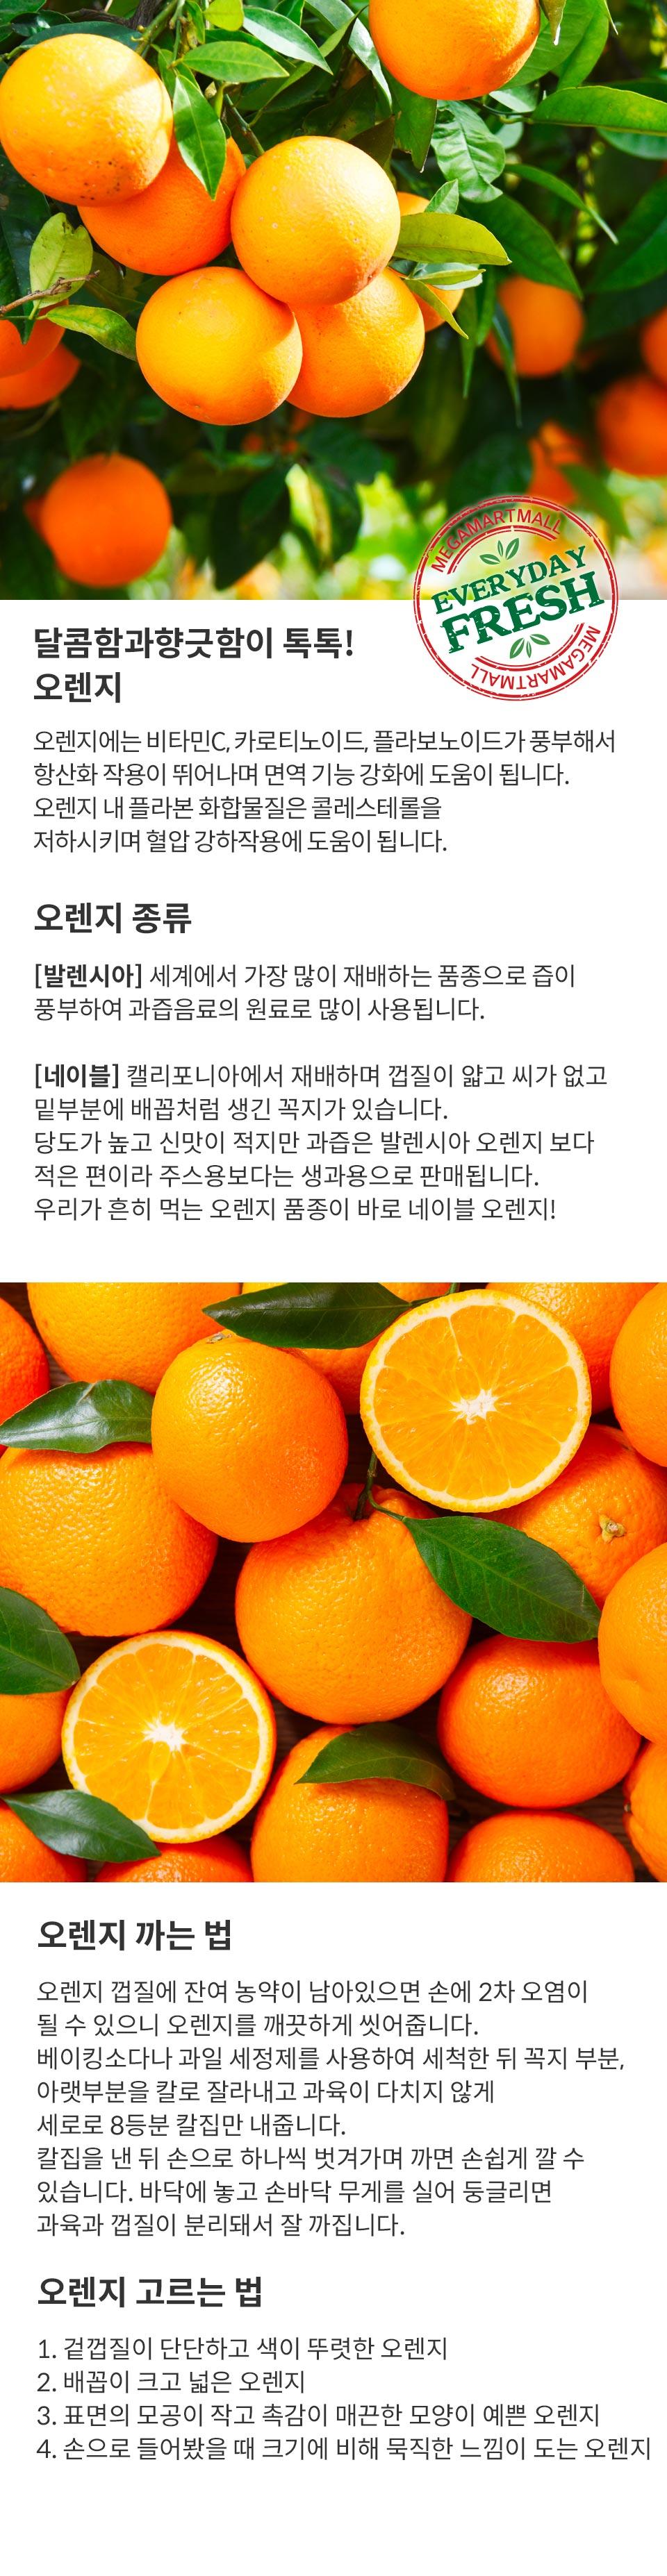 detail_orange.jpg